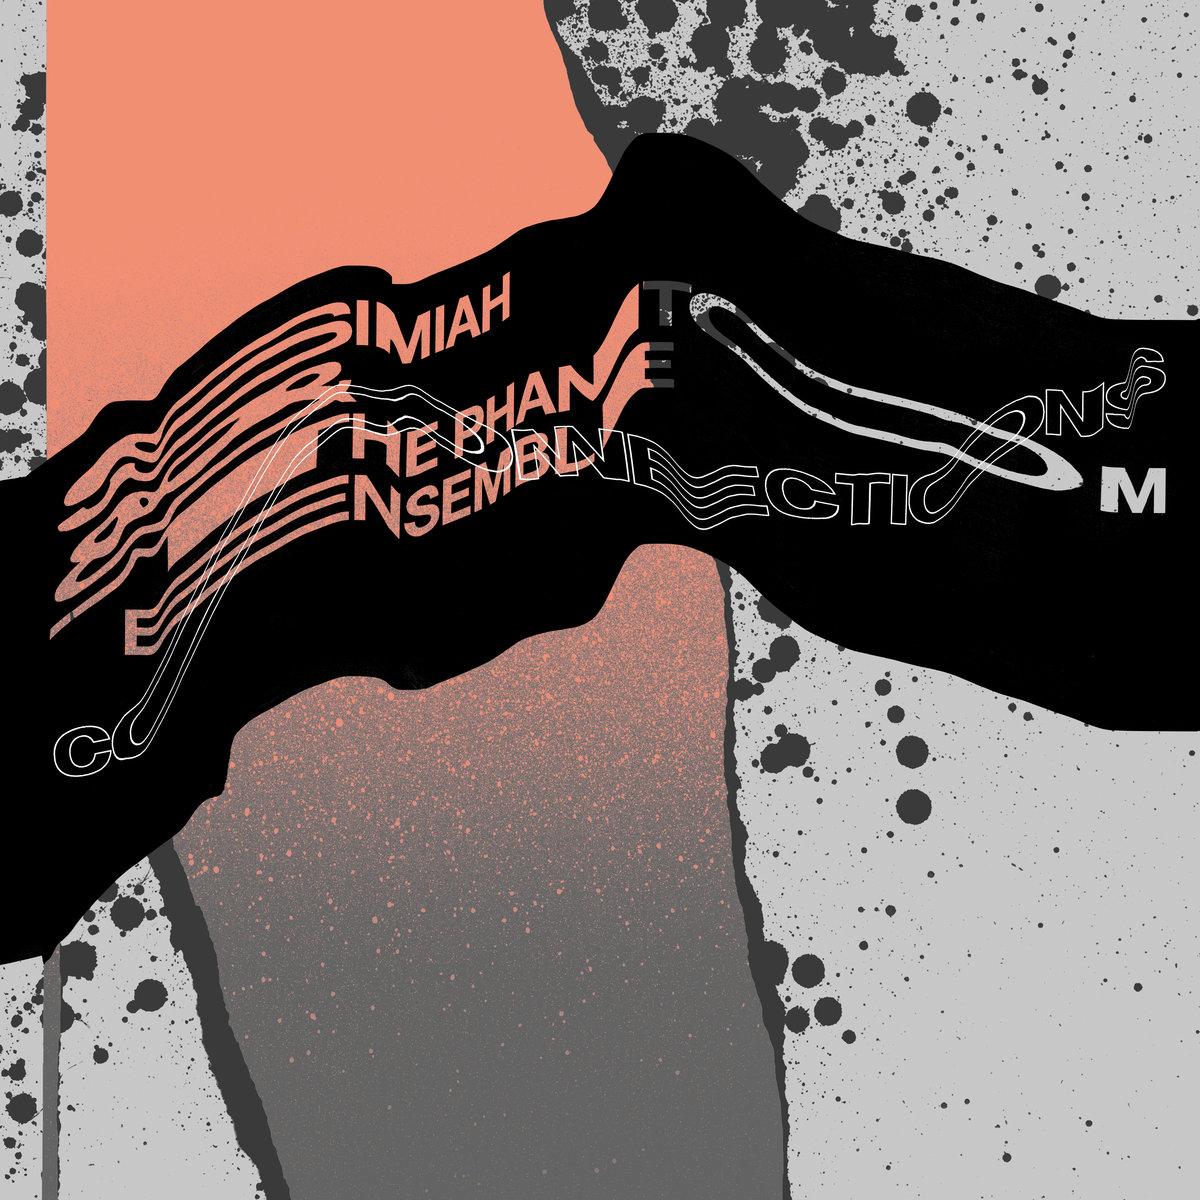 Simiah & The Phantom Ensemble – Flowing (The Find Premiere)